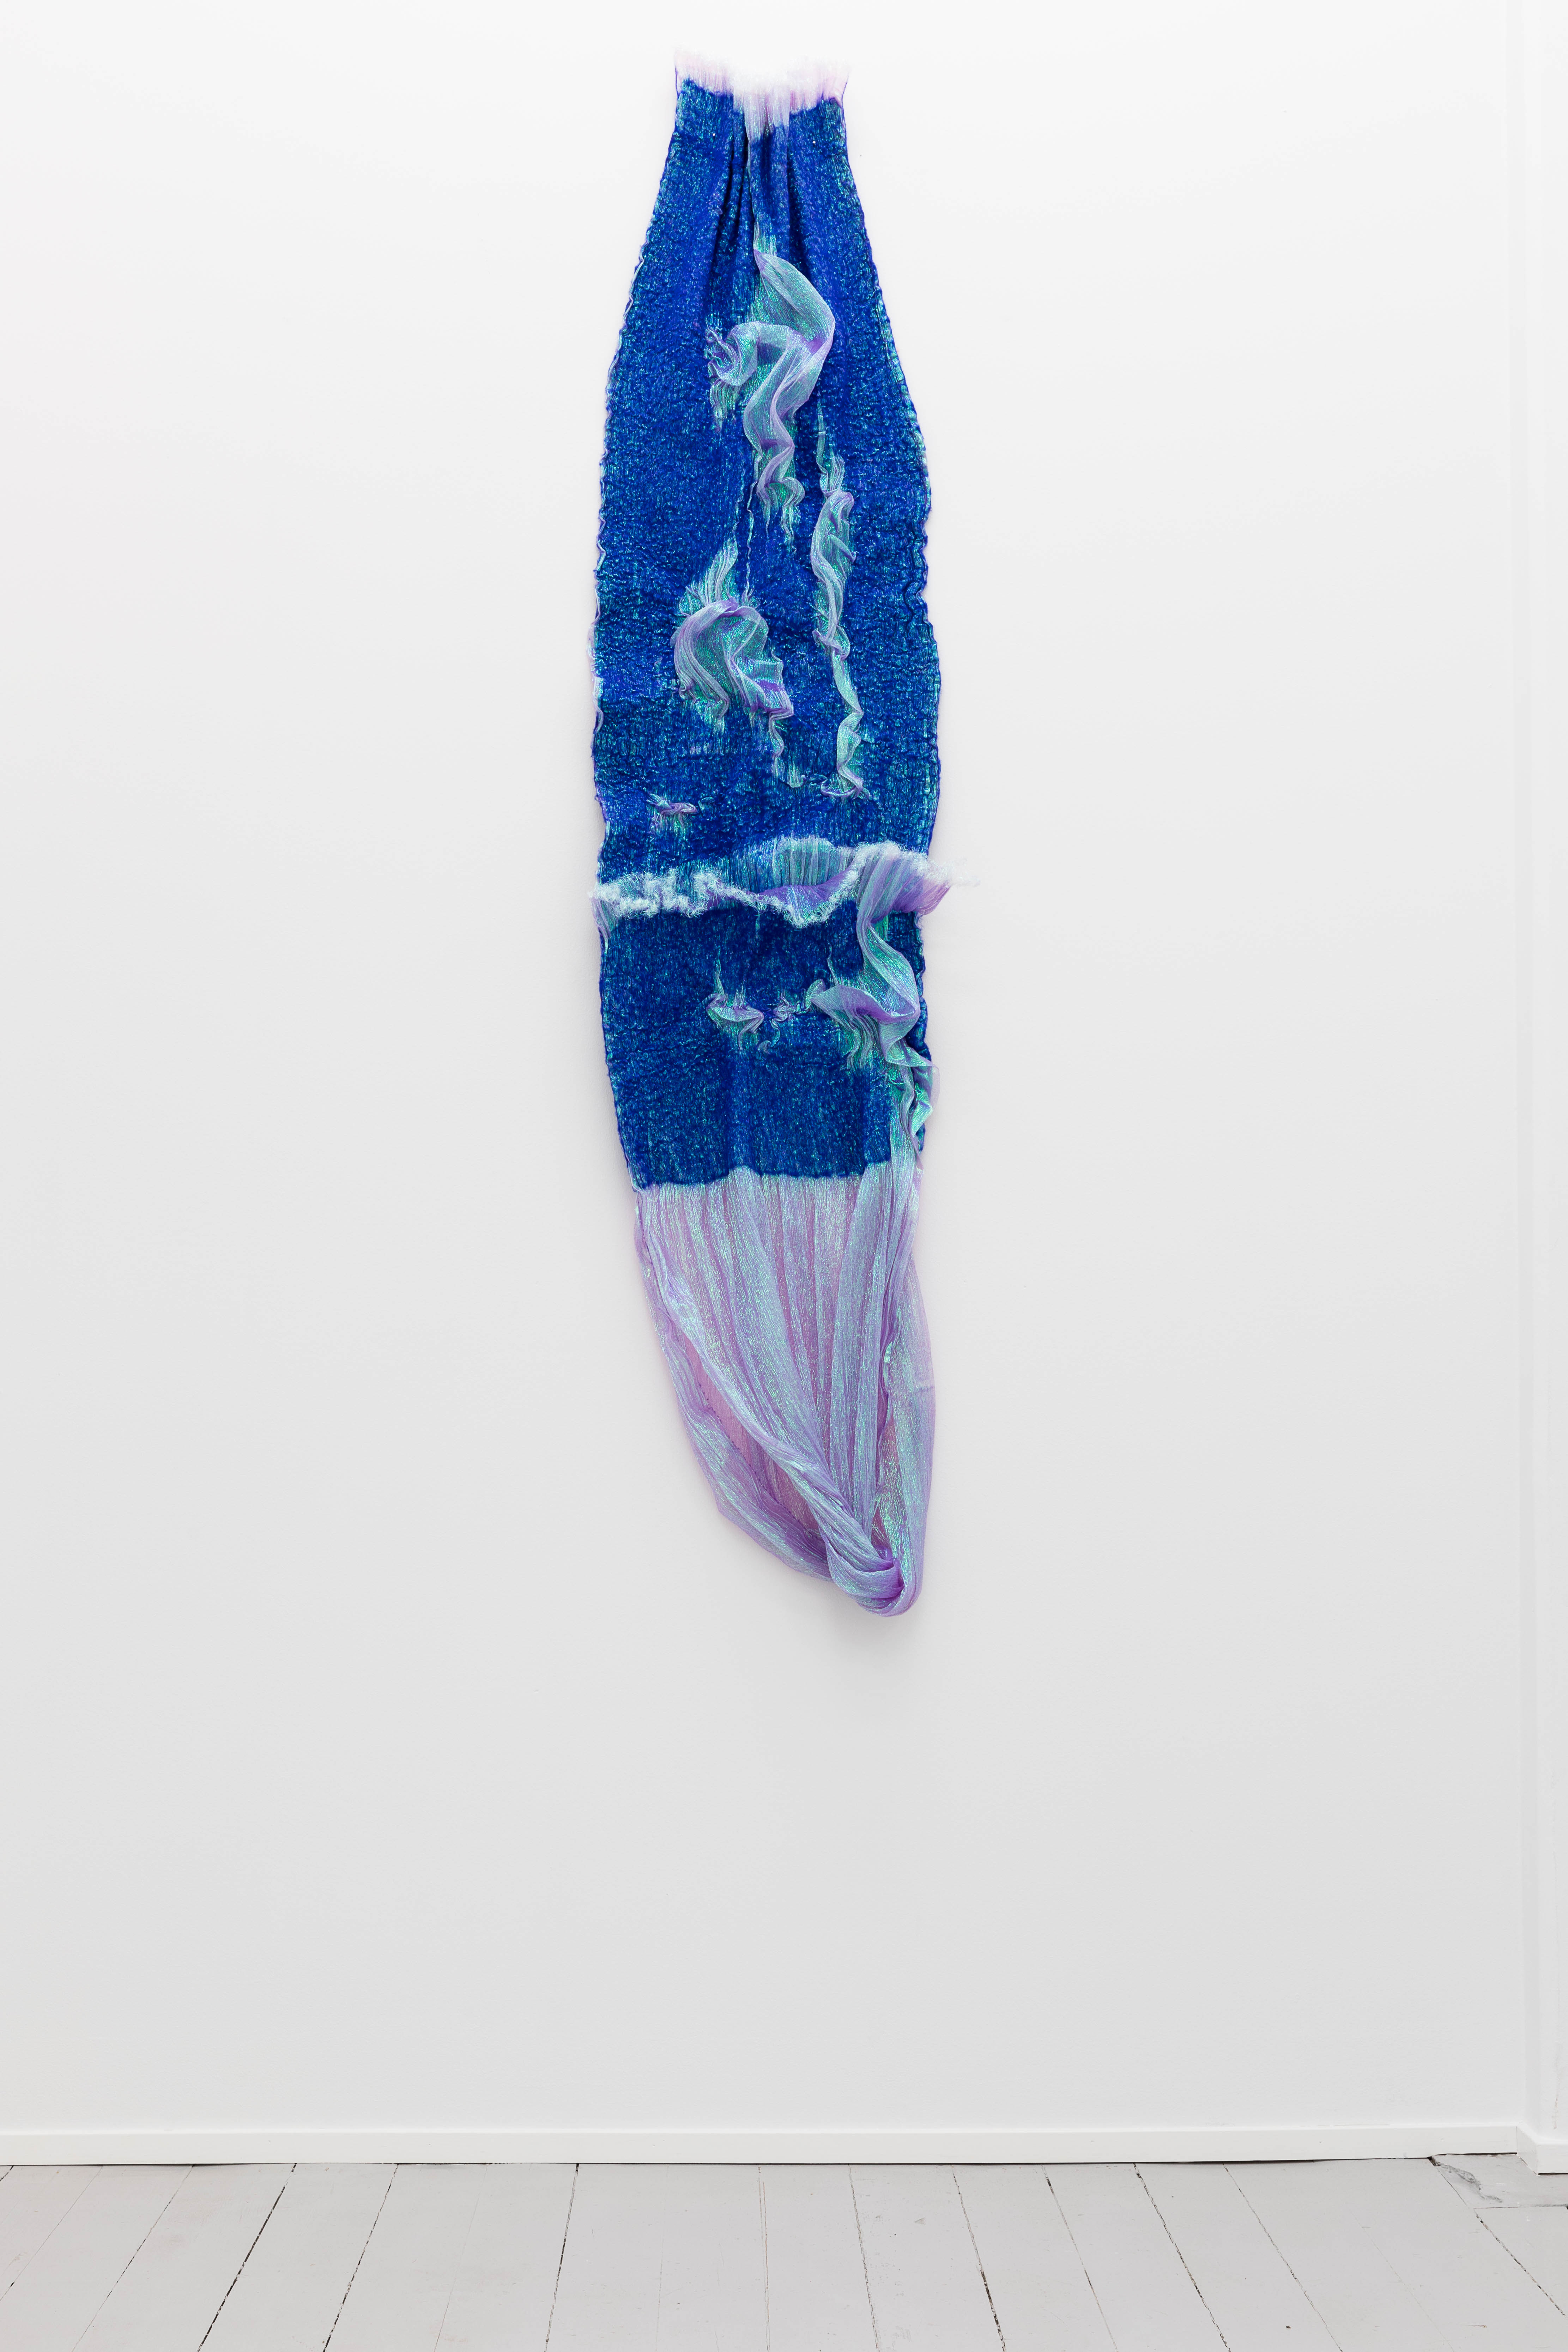 Rookie's Rave #7 Indigo, 2018, Merino wool, polyester organza, 180 x 40 x 10 cm